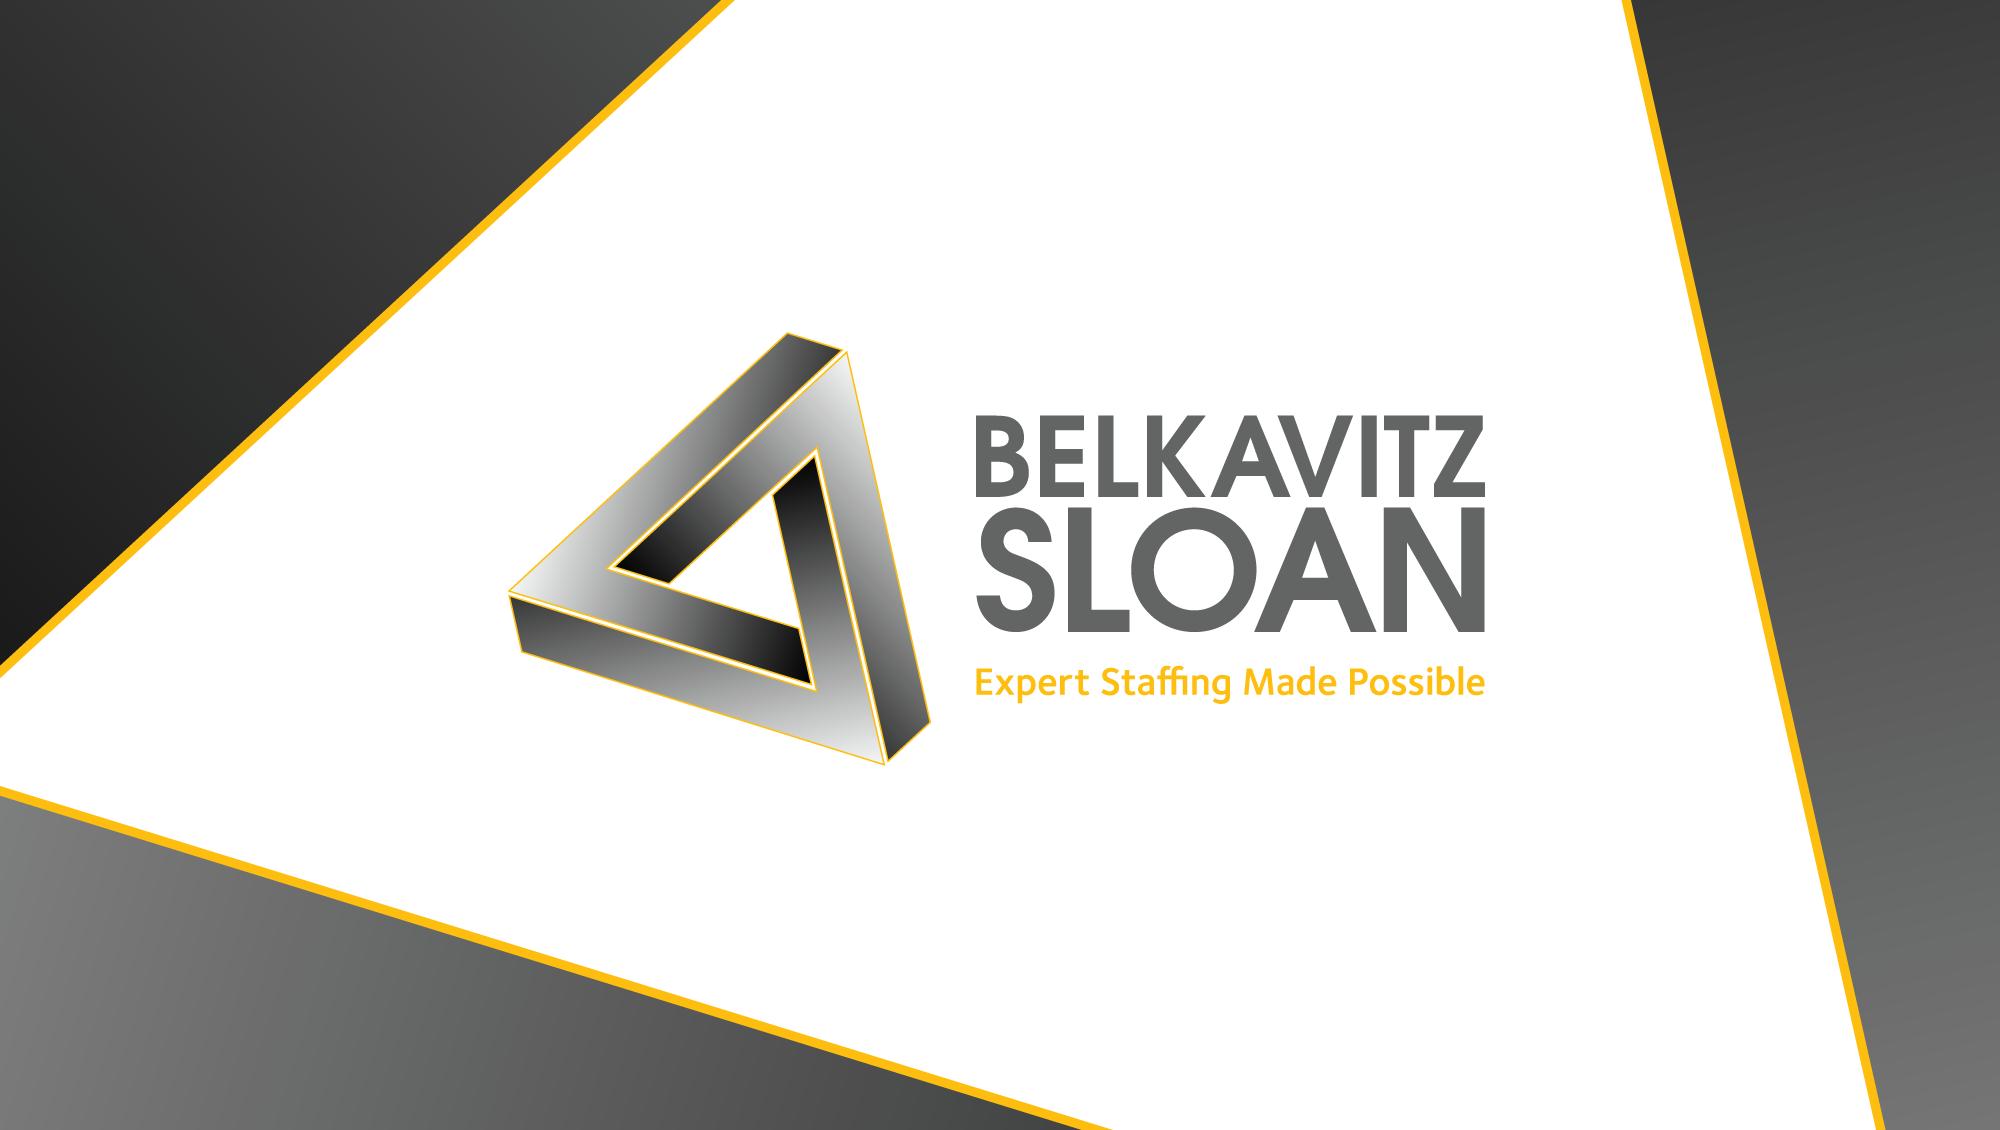 BelkavitzSloan brand